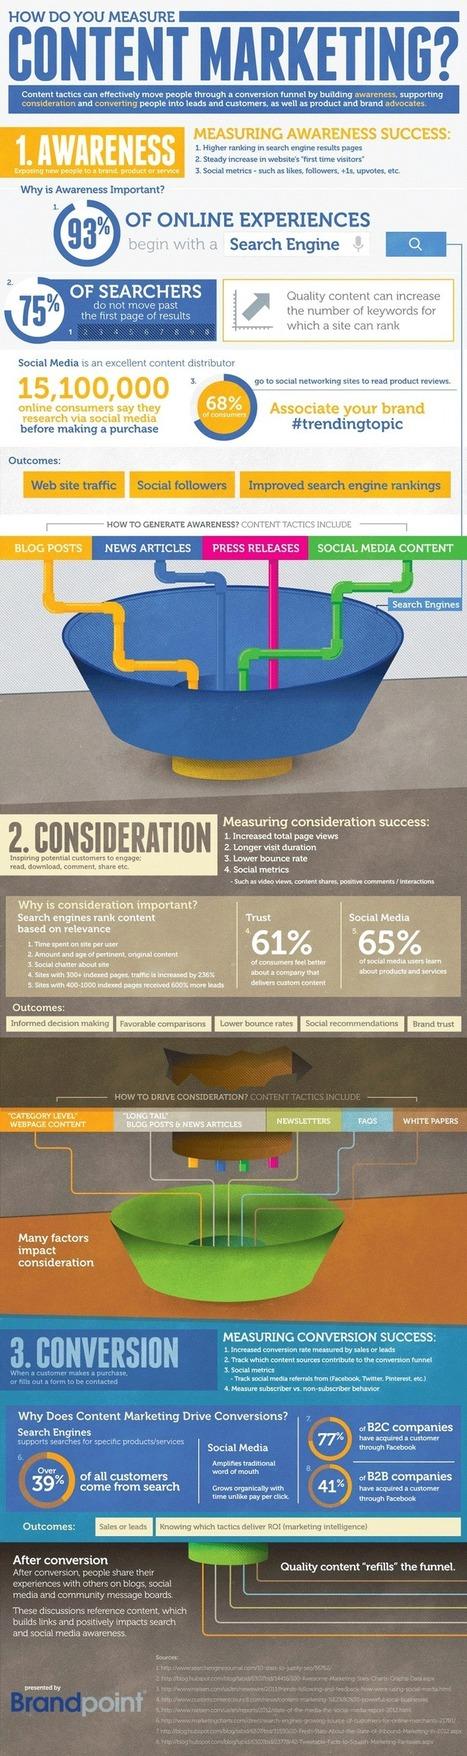 Measuring Your Content Marketing | Social Media e Innovación Tecnológica | Scoop.it